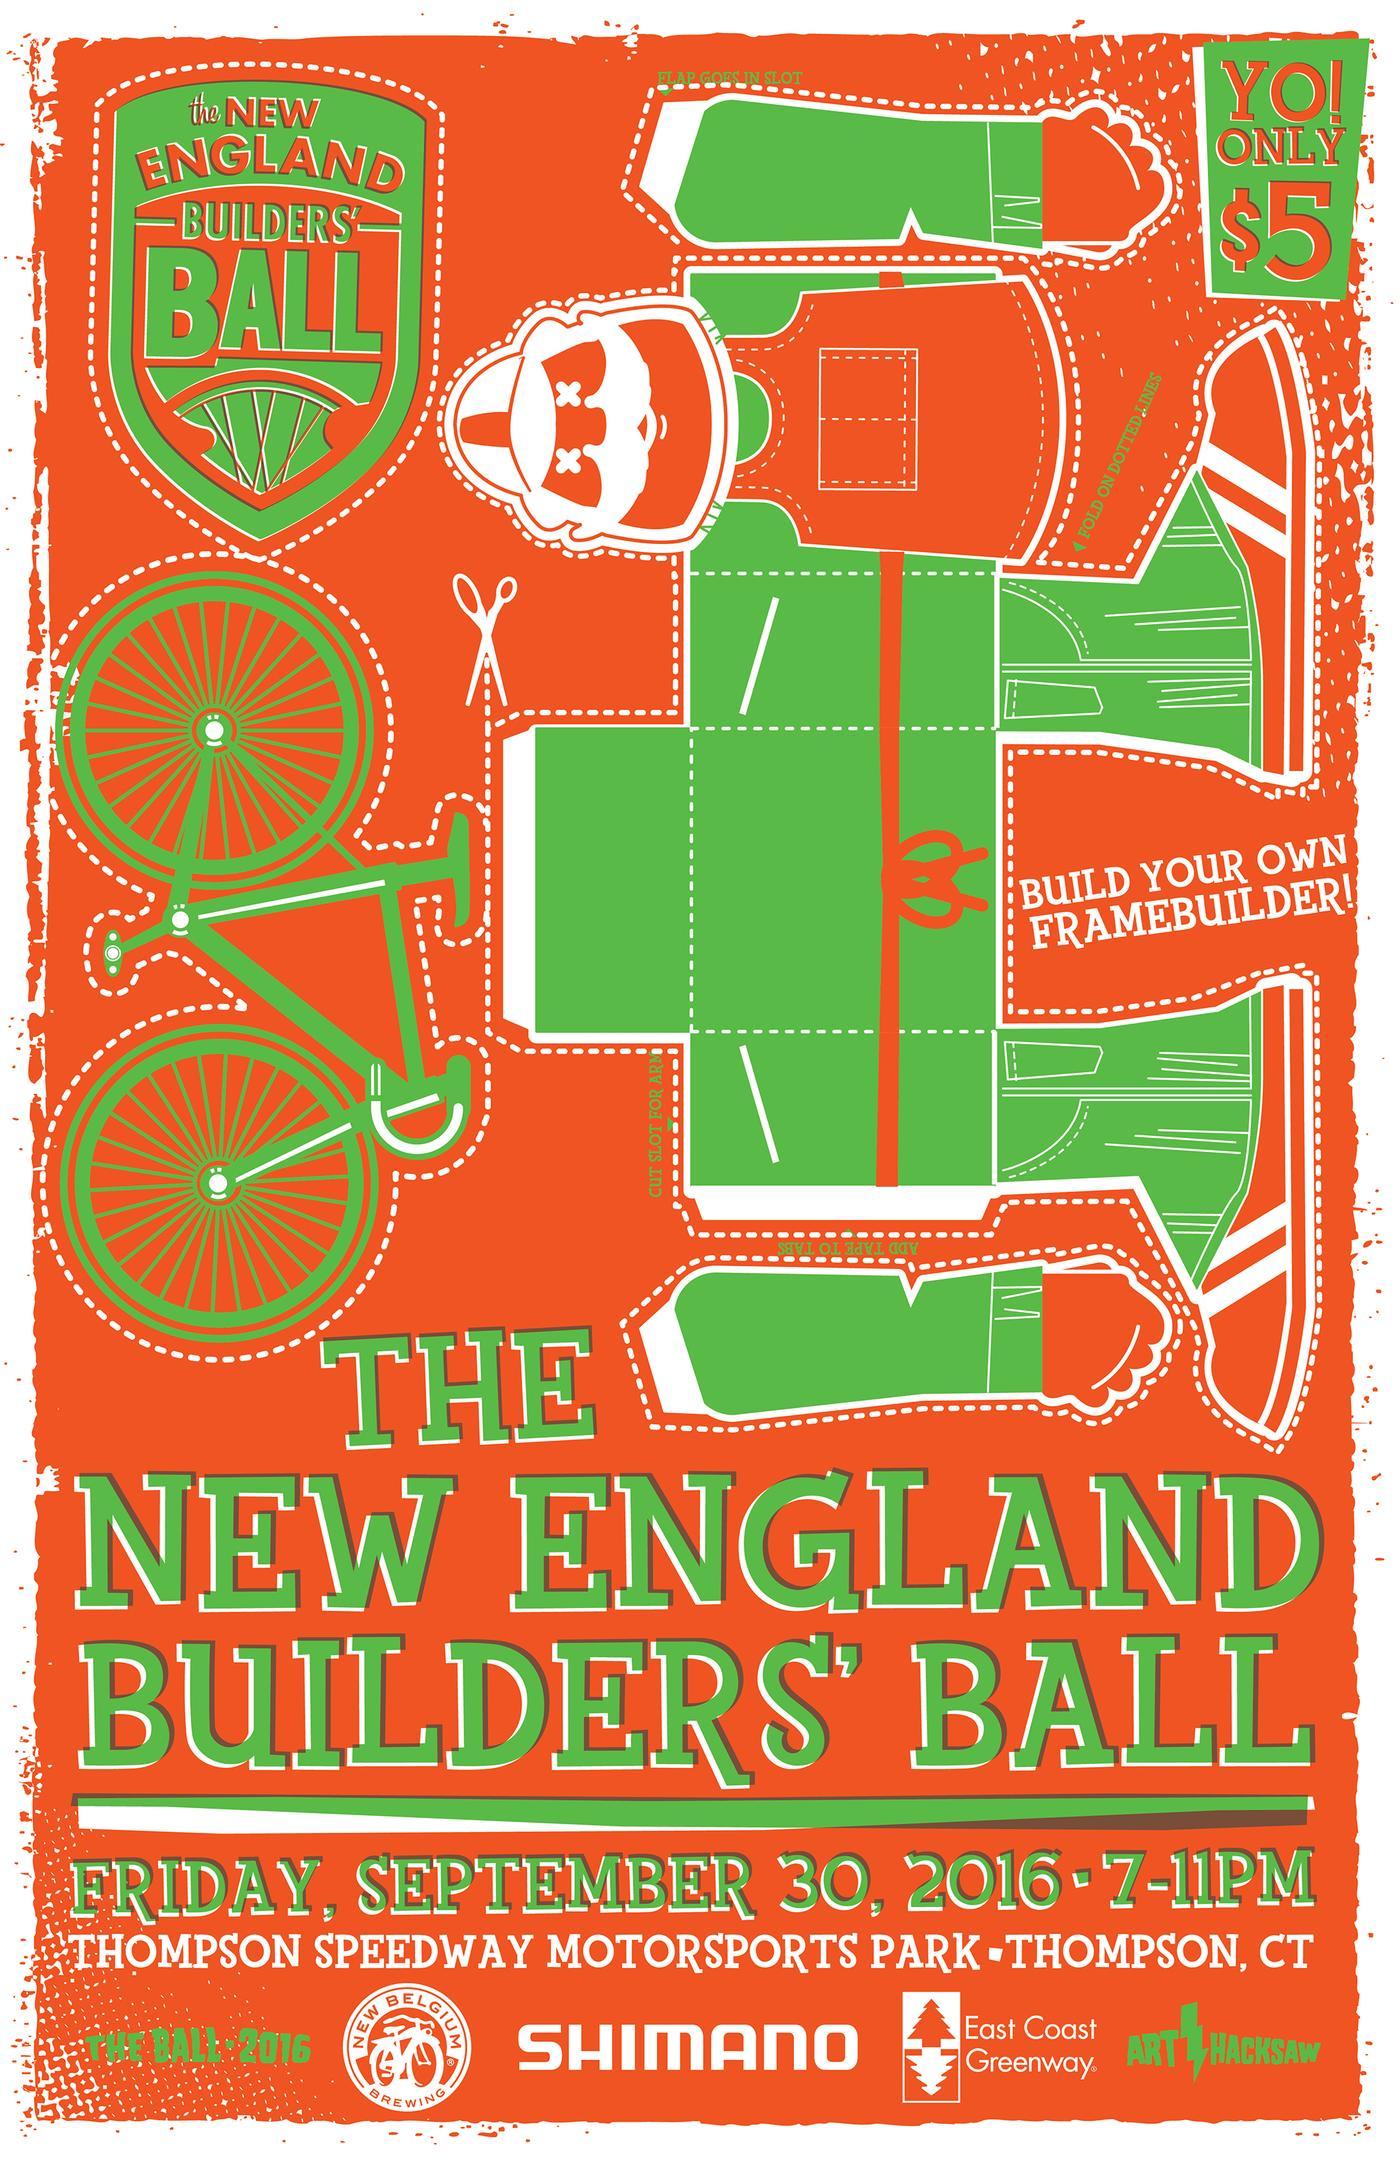 The New England Builder's Ball Returns